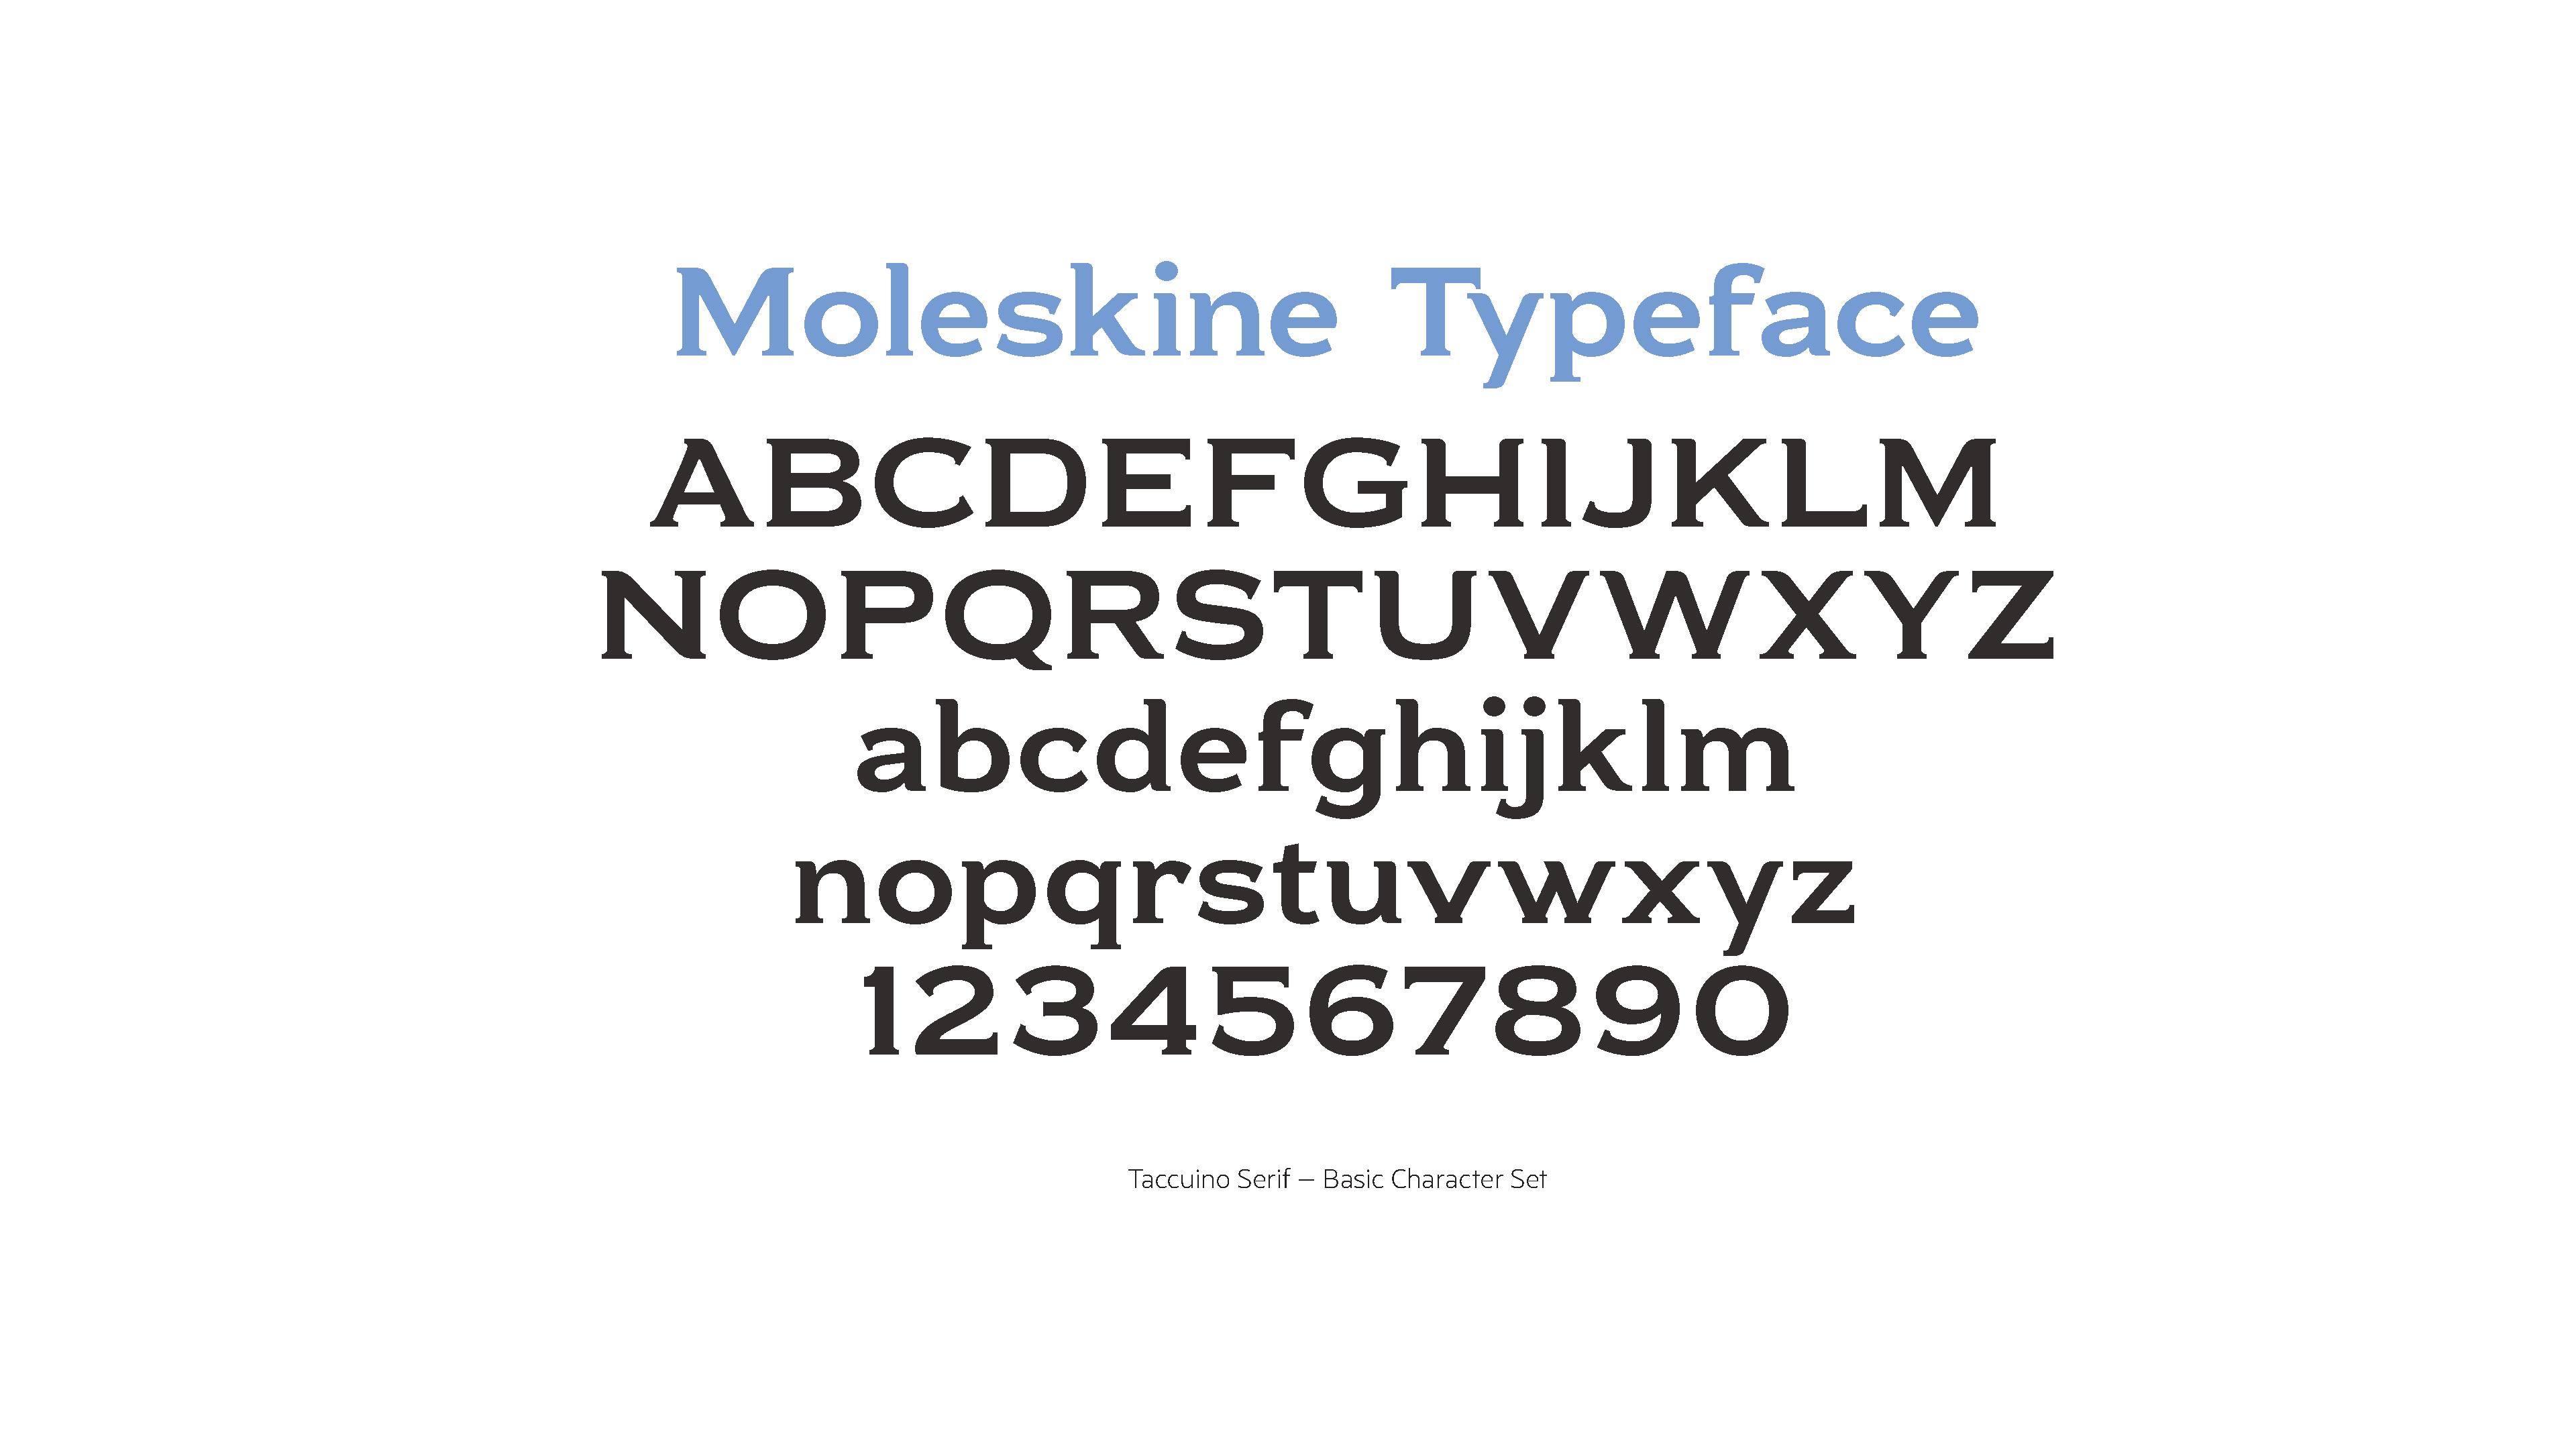 MOLESKINE-typeface-01